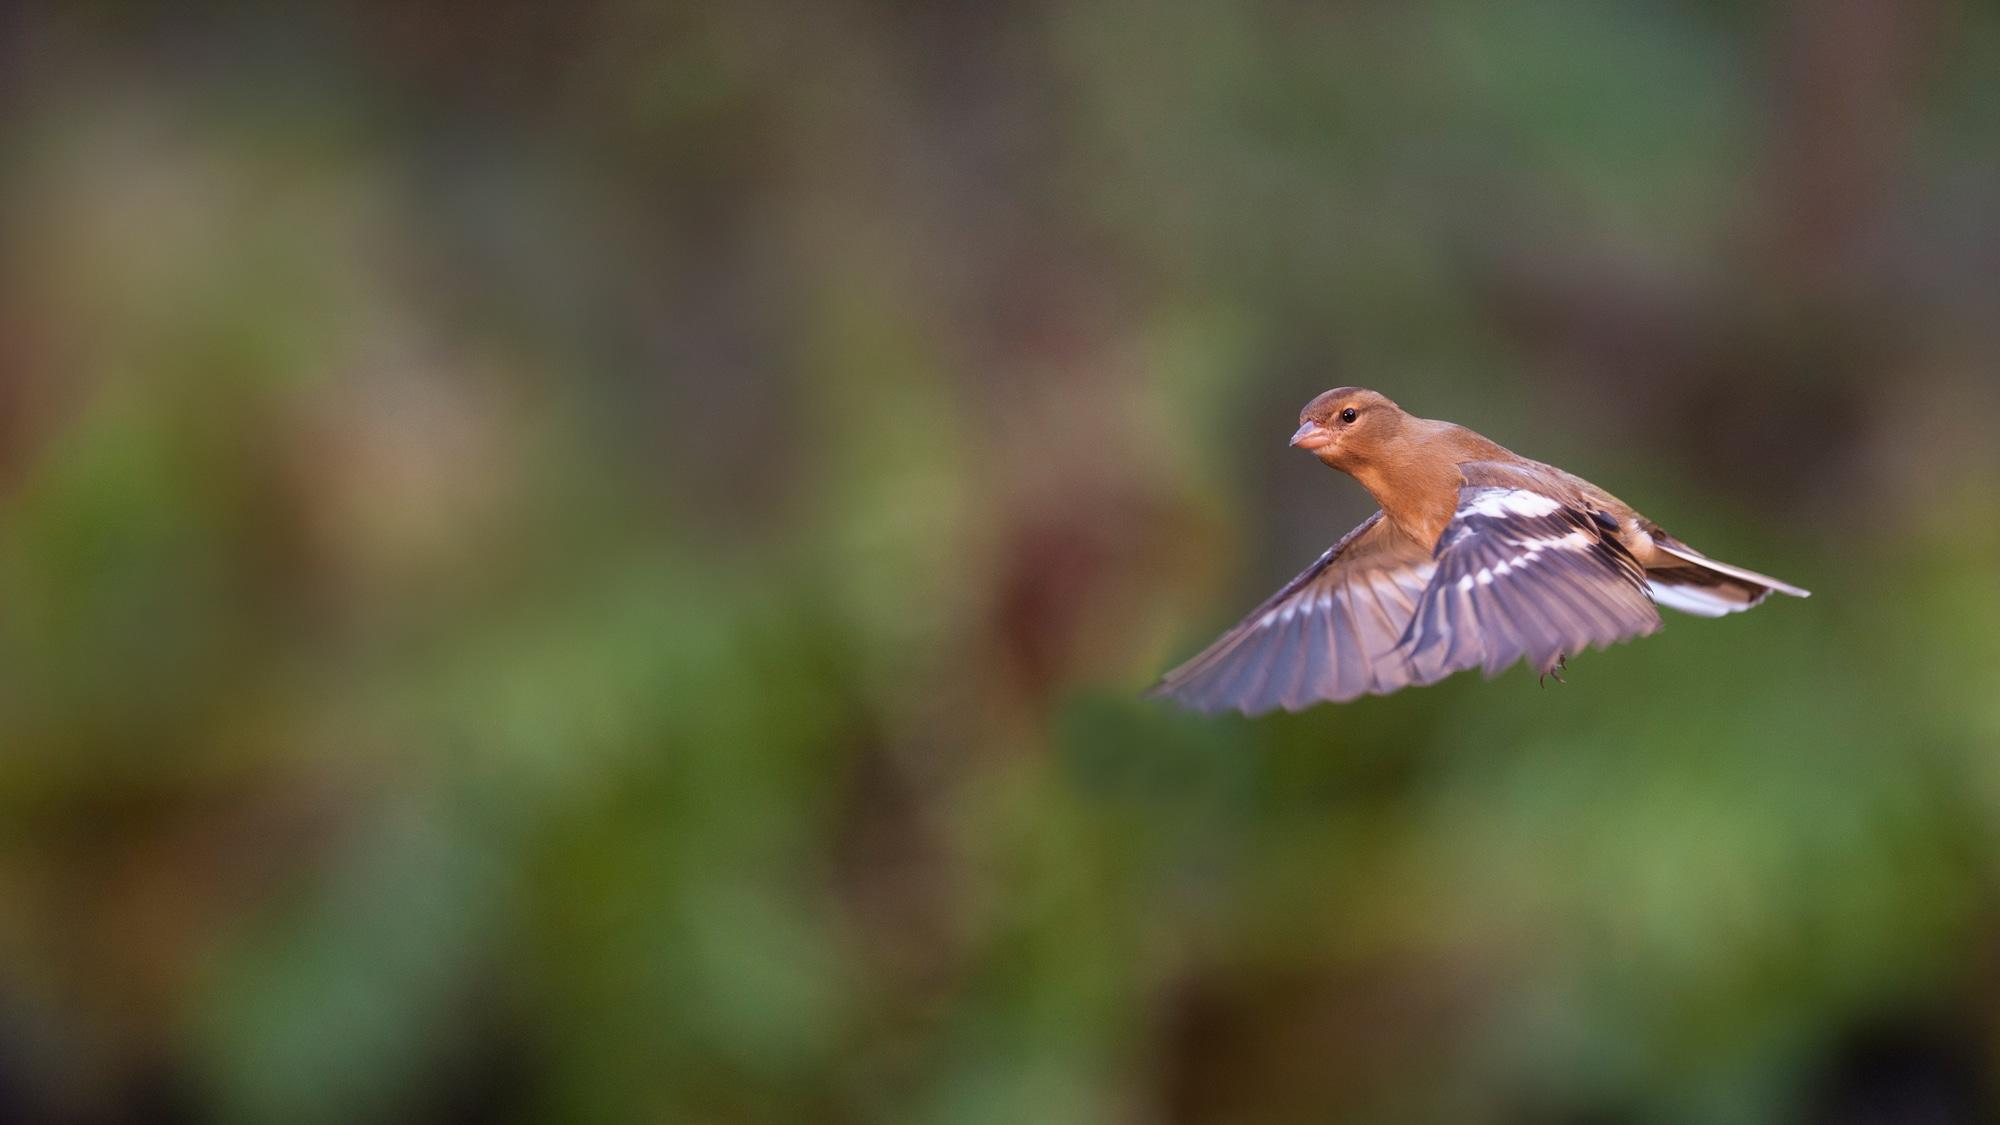 A flying chaffinch